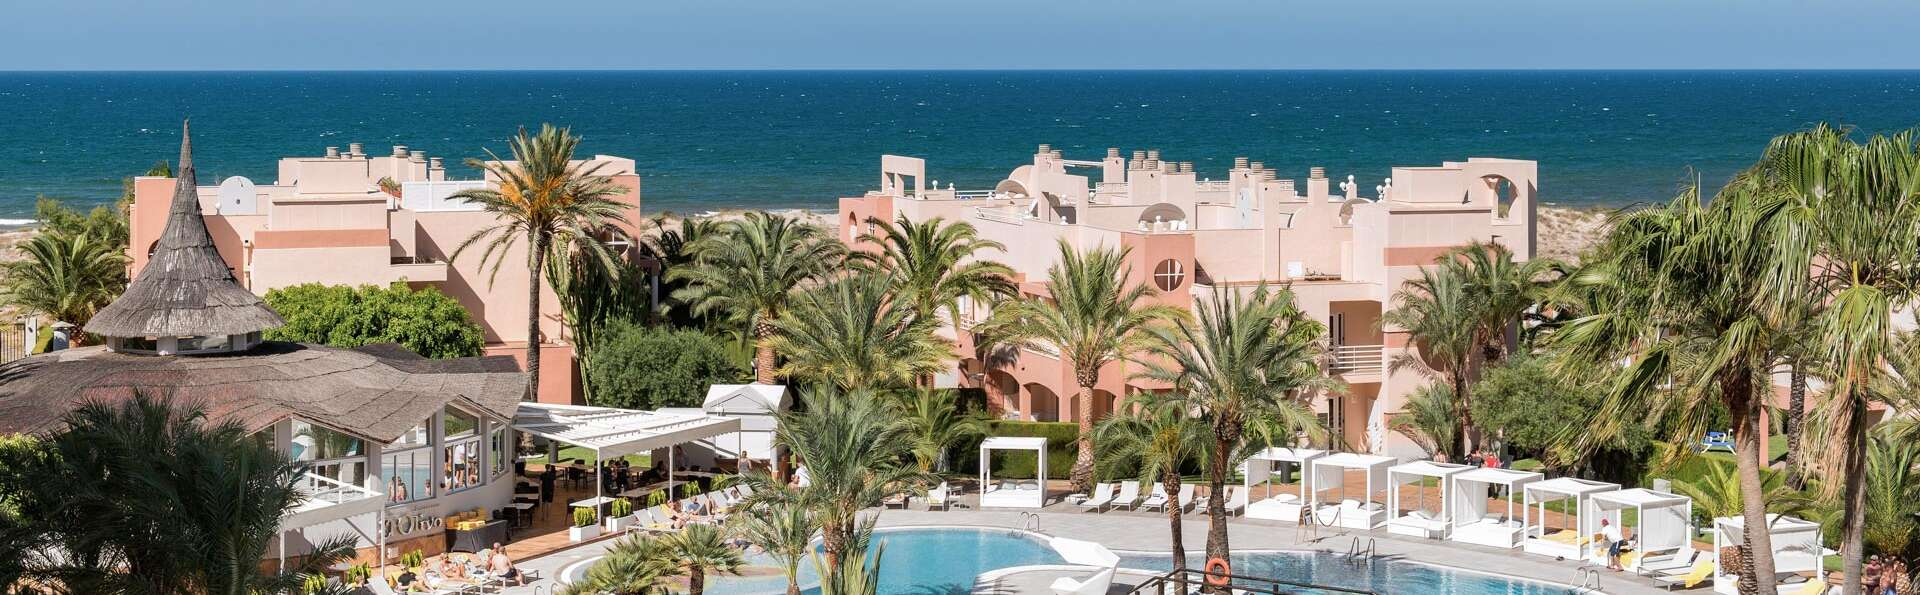 Oliva Nova Beach & Golf Hotel - EDIT_POOL_07.jpg